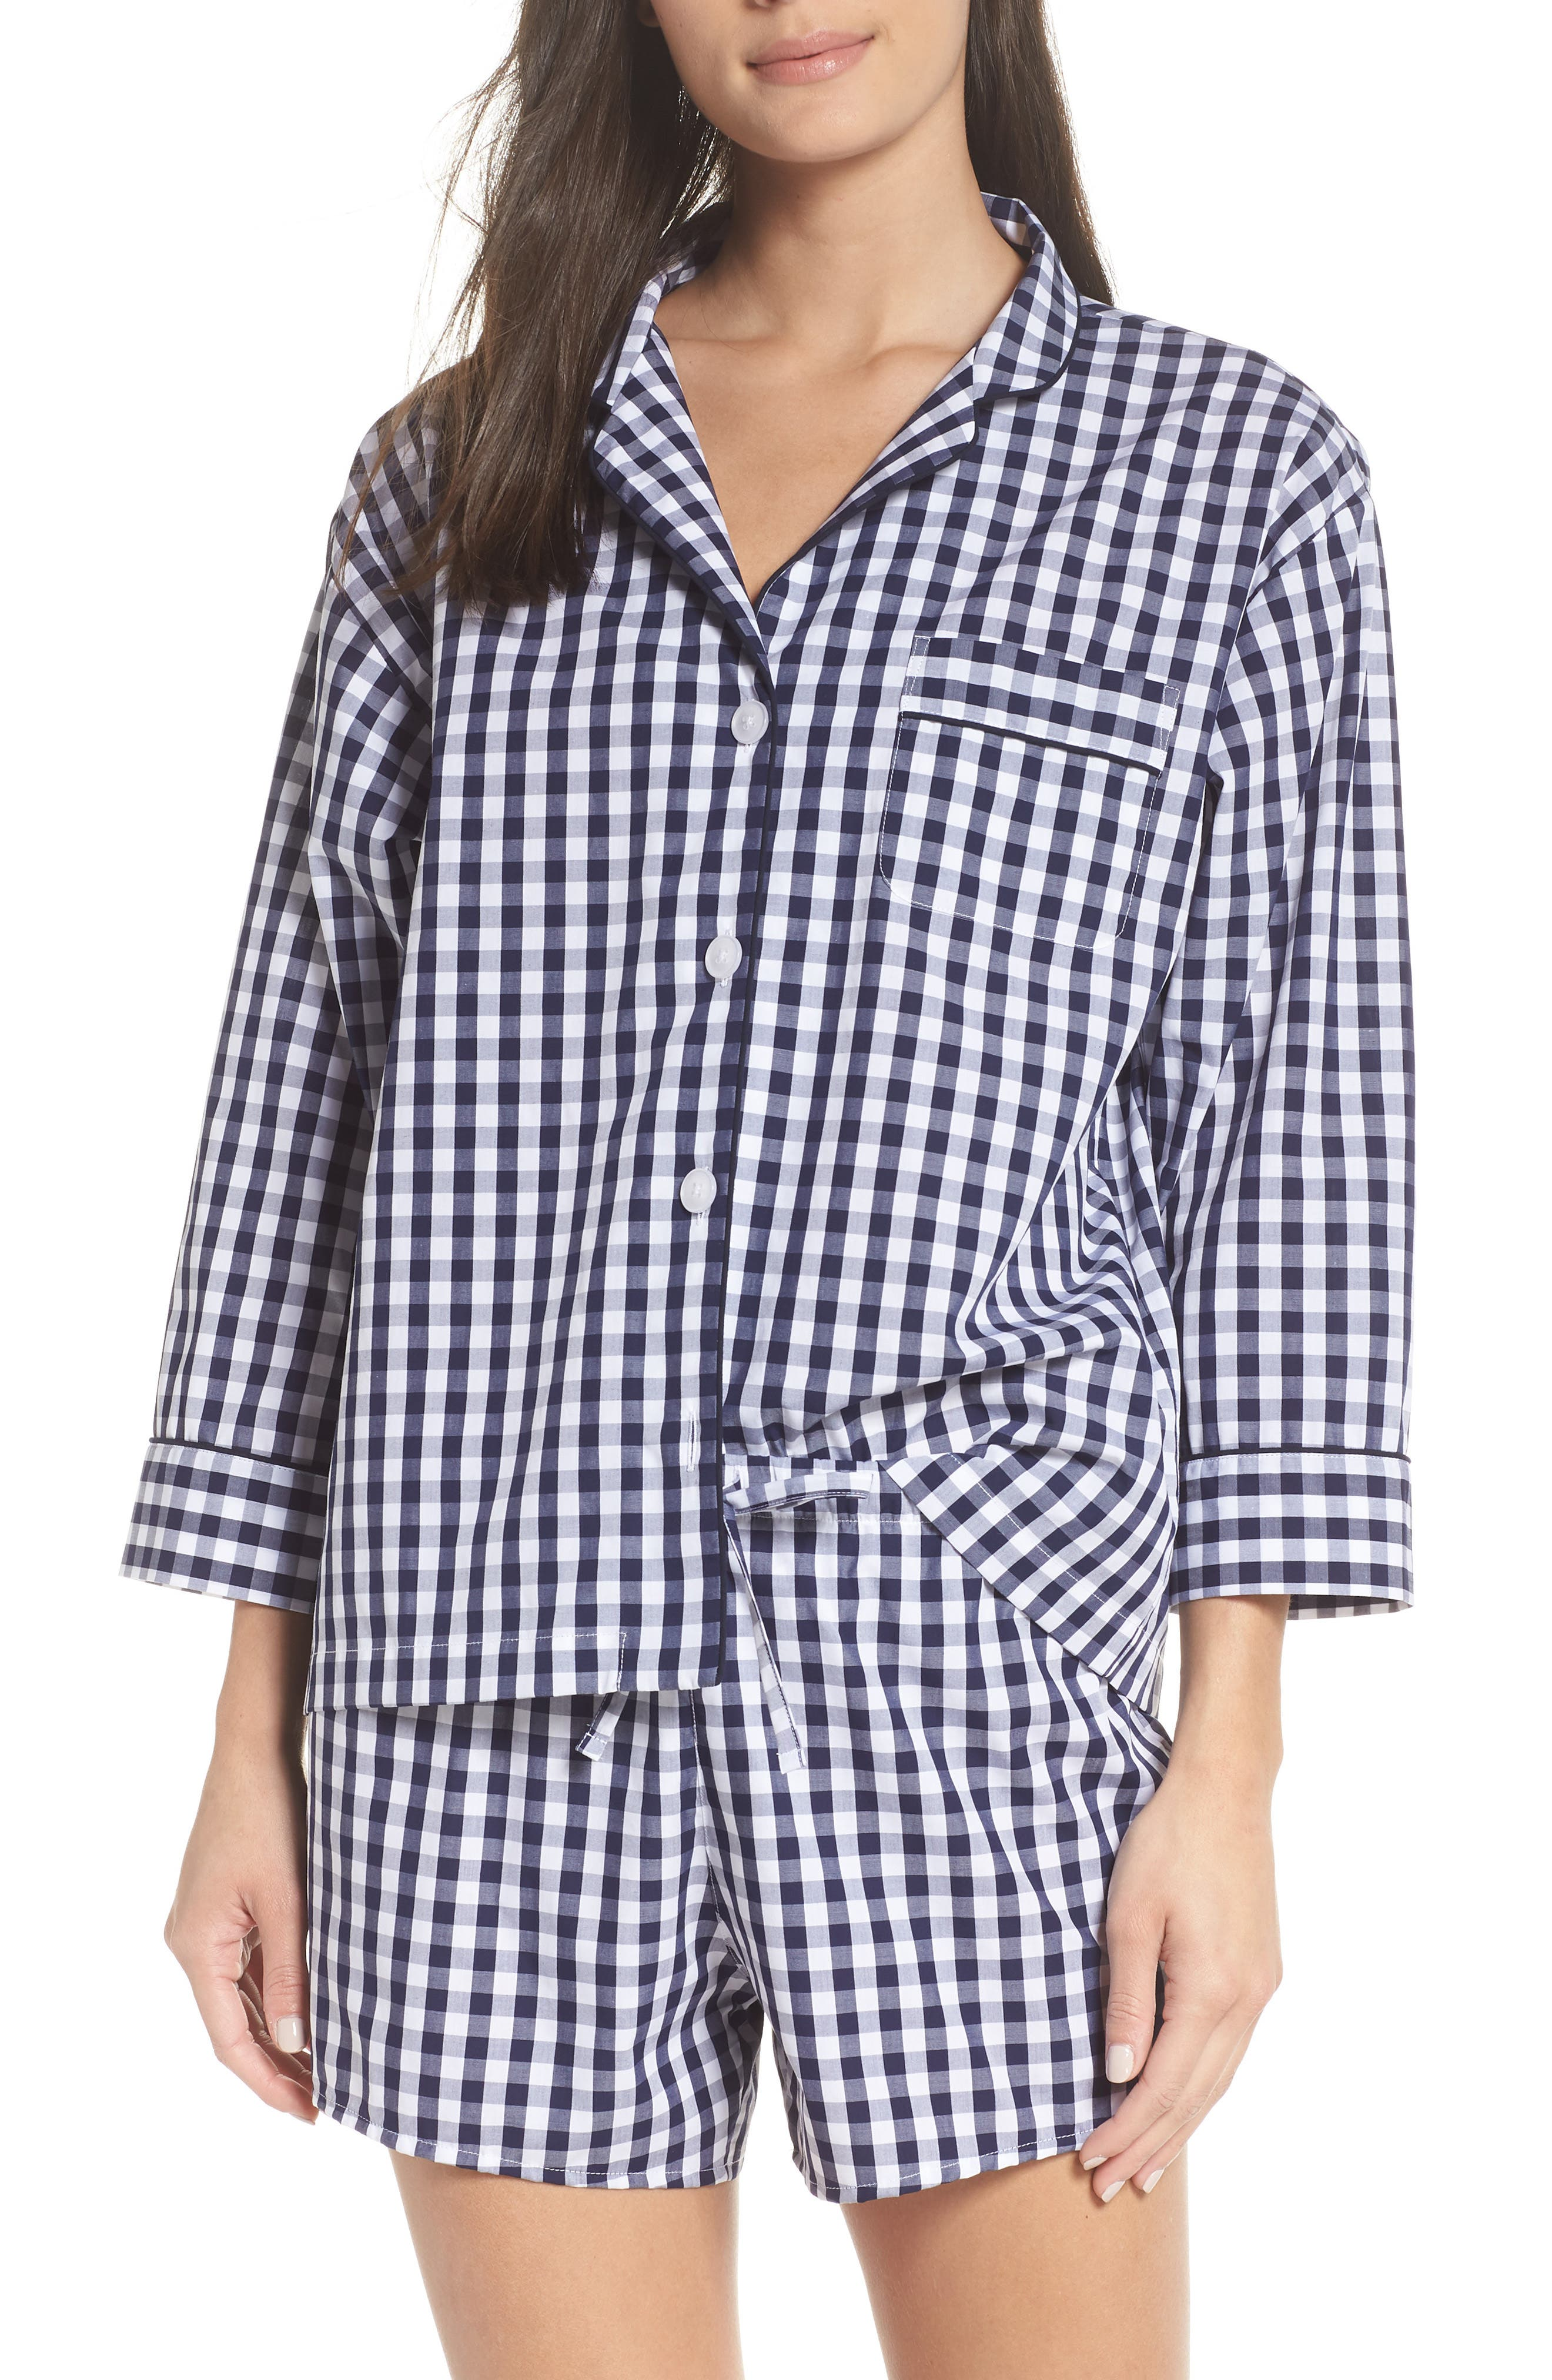 Marina Women's Pajama Shirt,                             Alternate thumbnail 2, color,                             LARGE GINGHAM BLUE